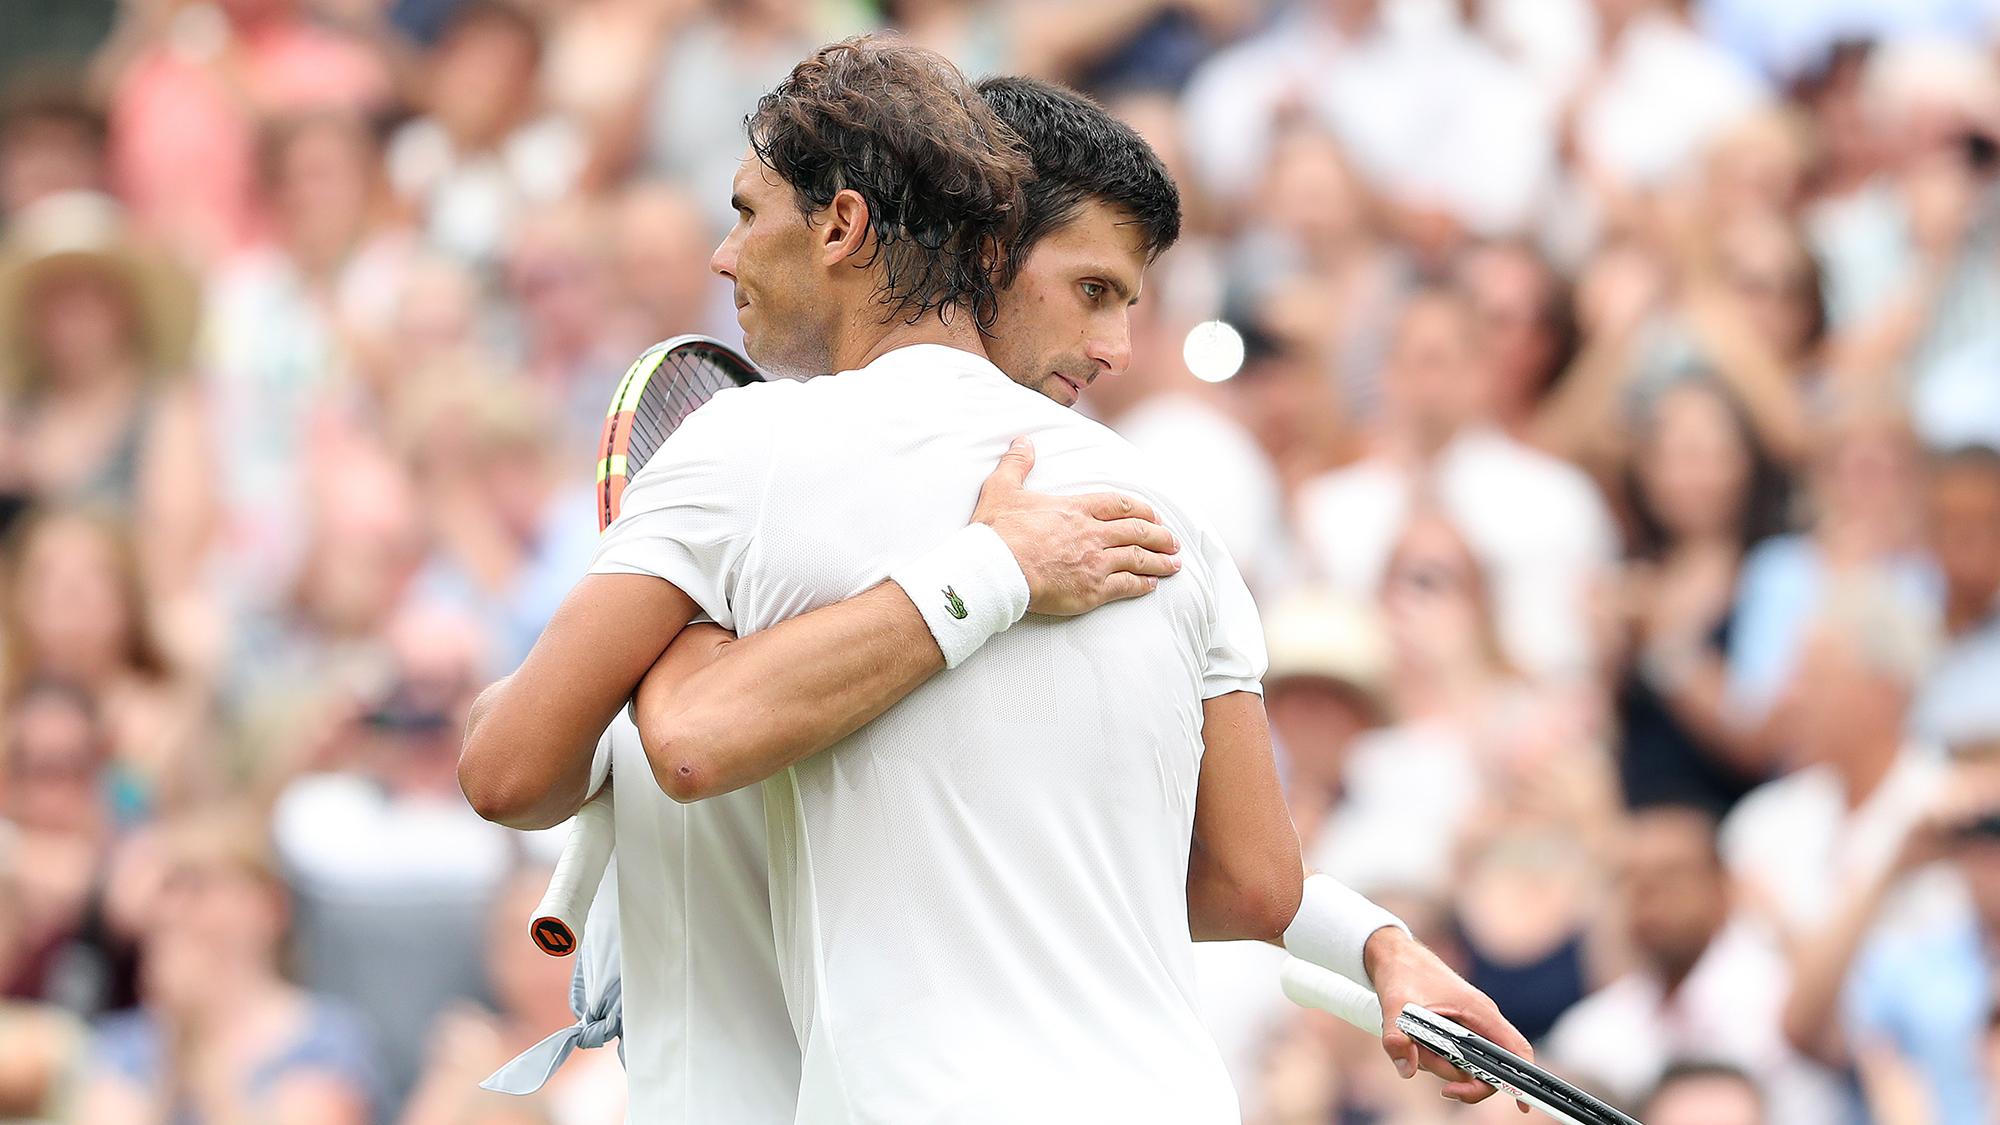 Rafael nadal Novak Djokovic saudi arabia exhibition